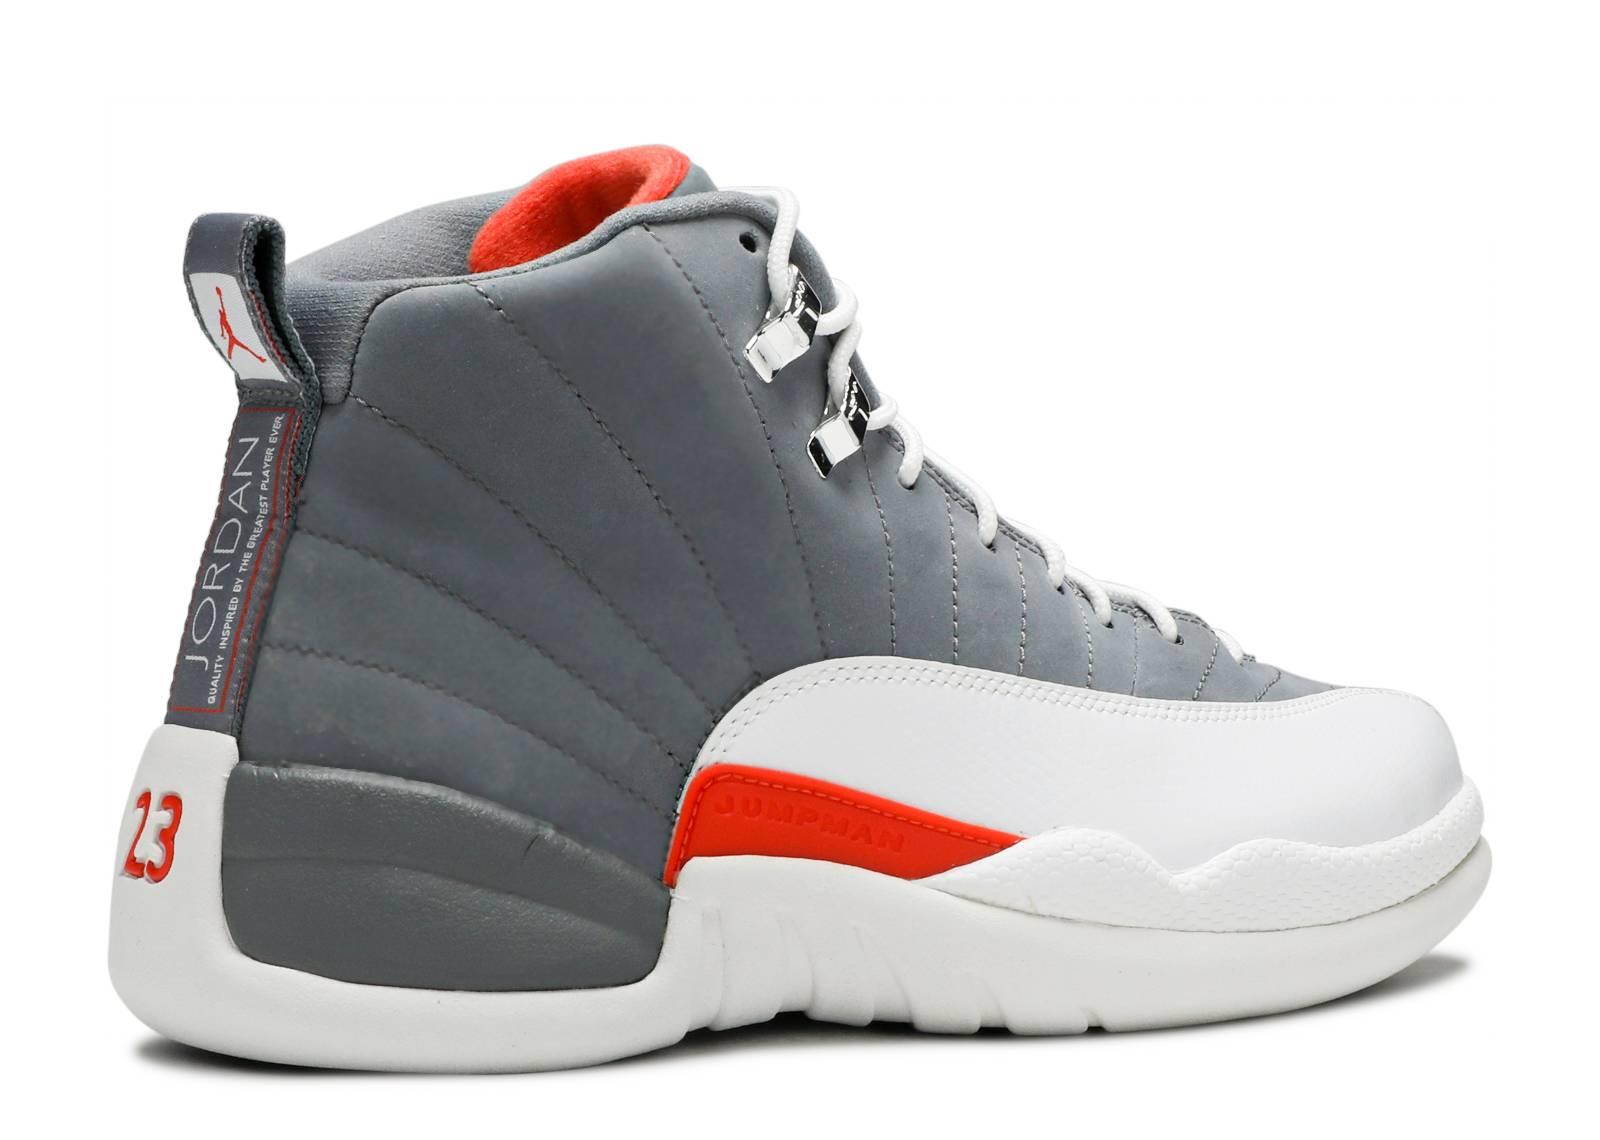 super popular e65c0 5ba54 Shop Cheap Nike Air Jordan 12 Retro Cheap sale Cool Grey ...